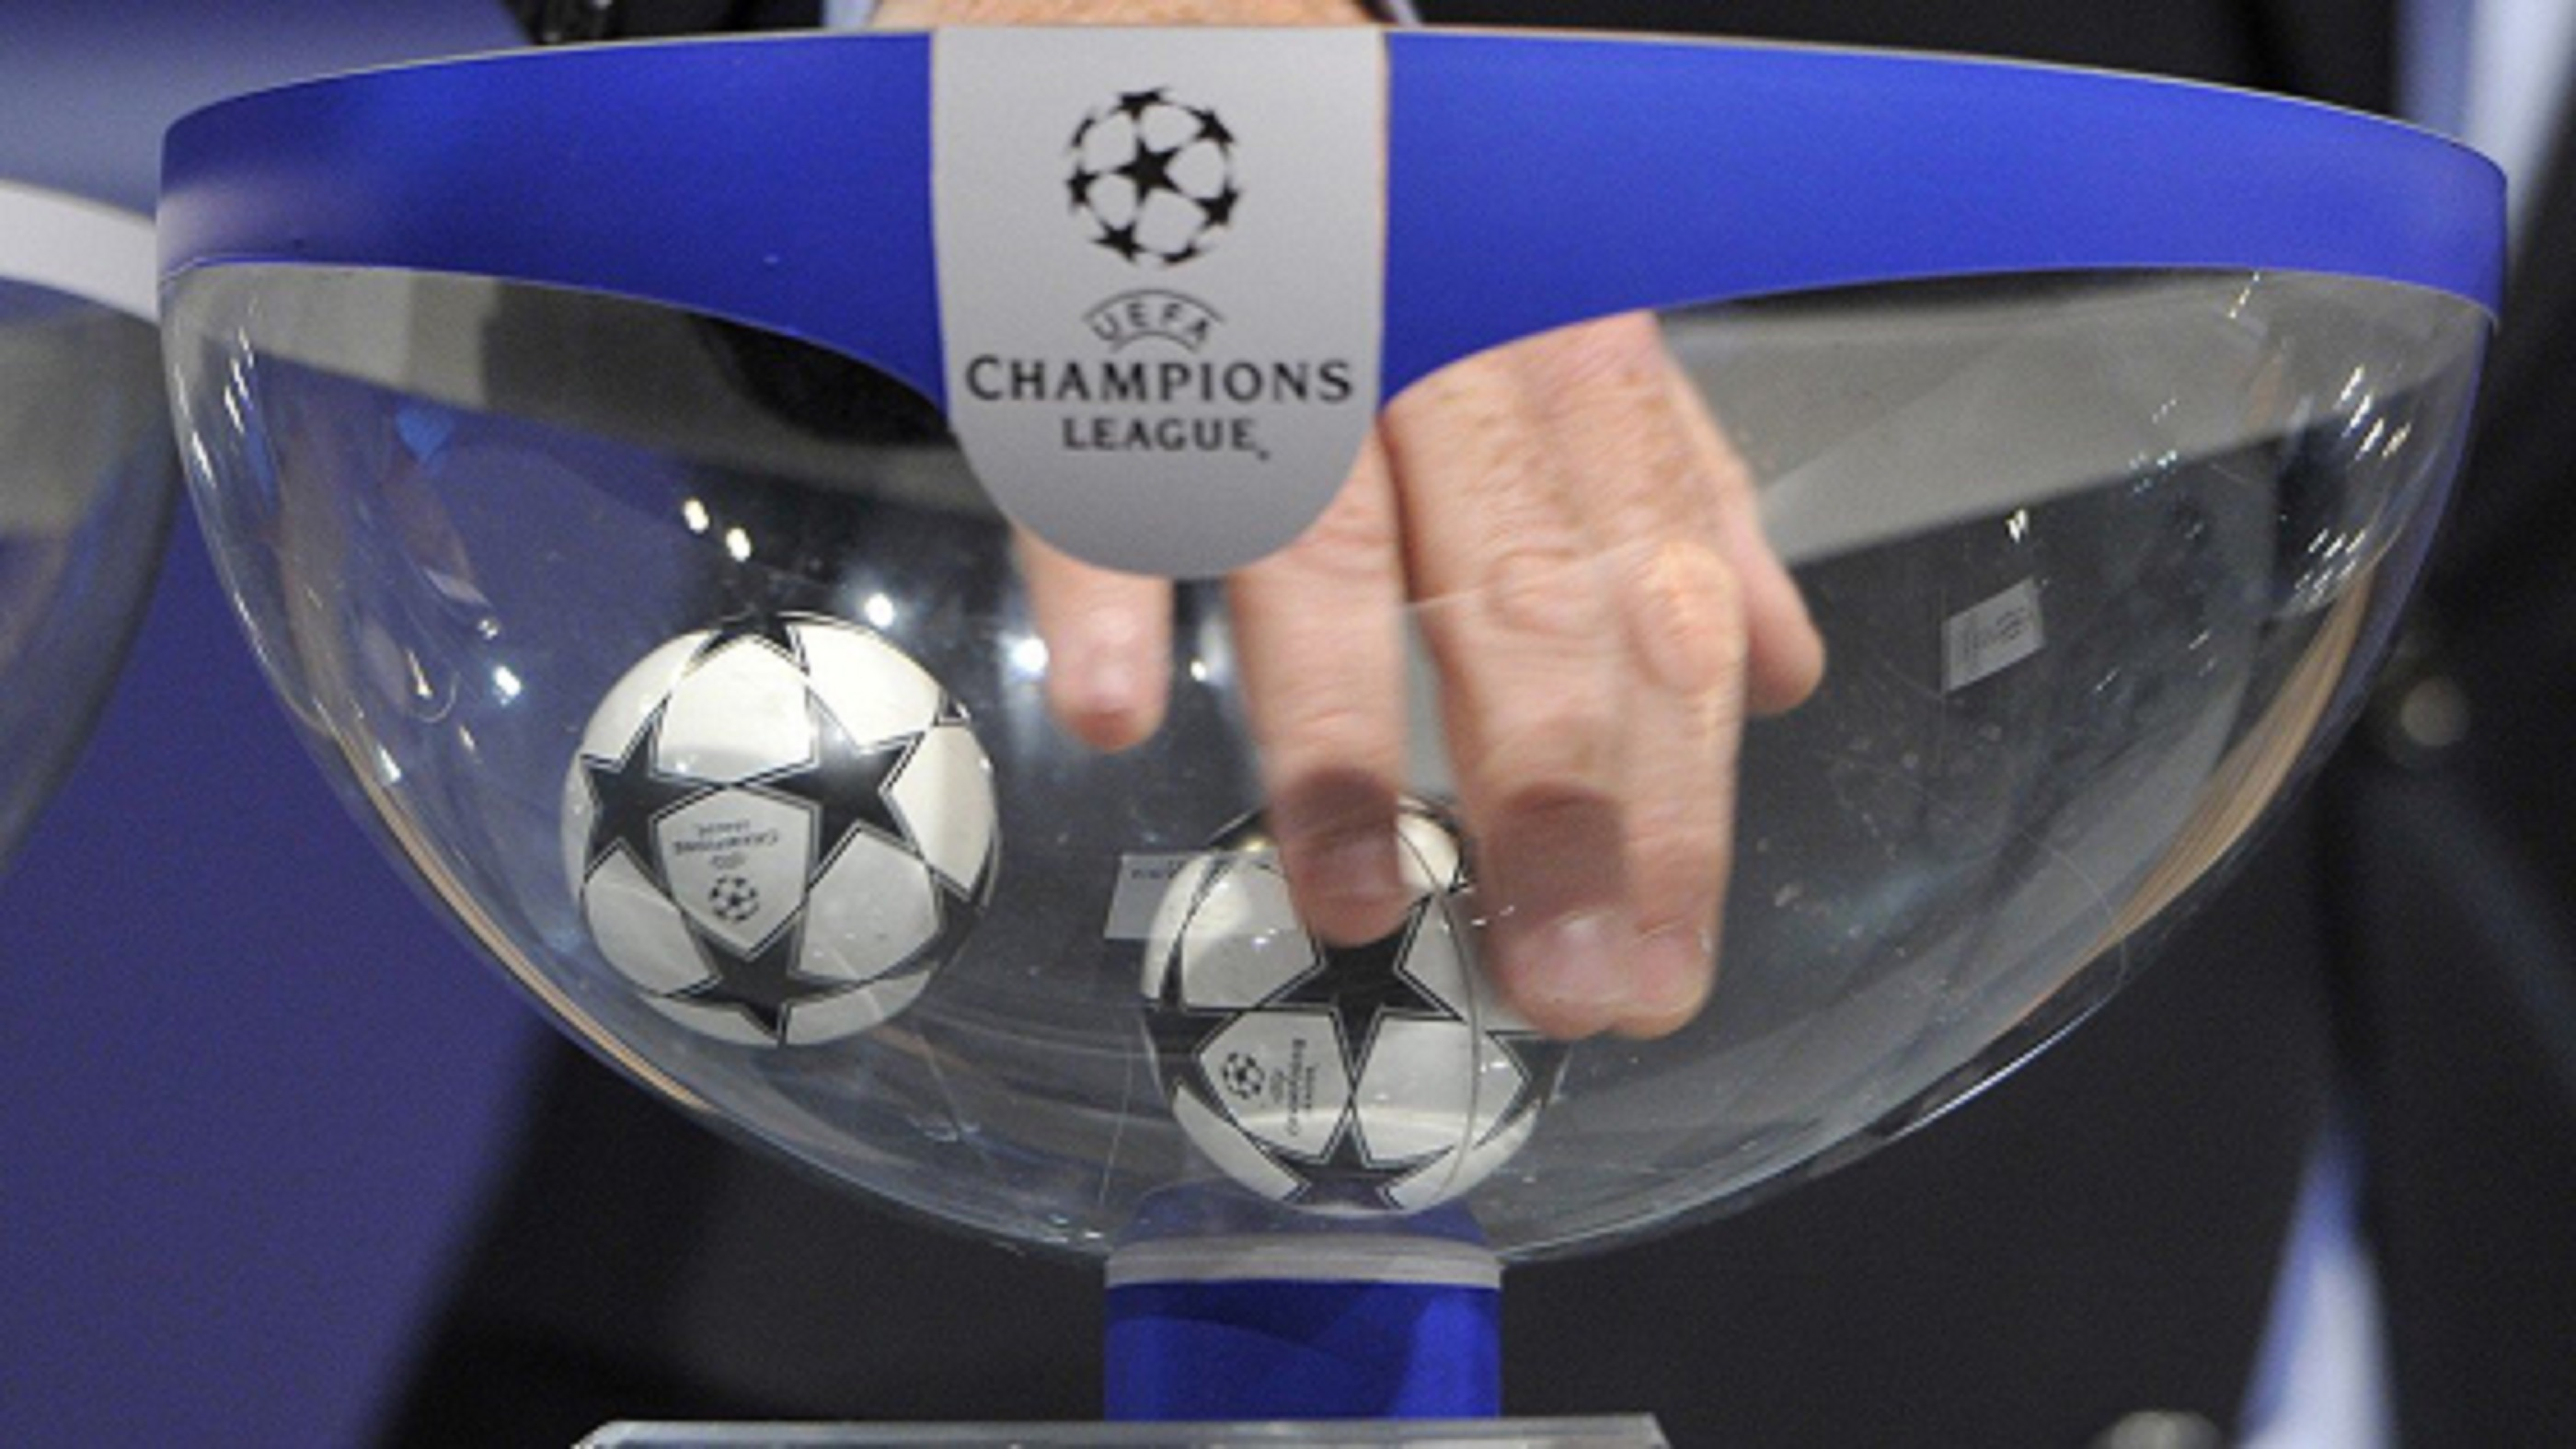 grupos de la Champions League